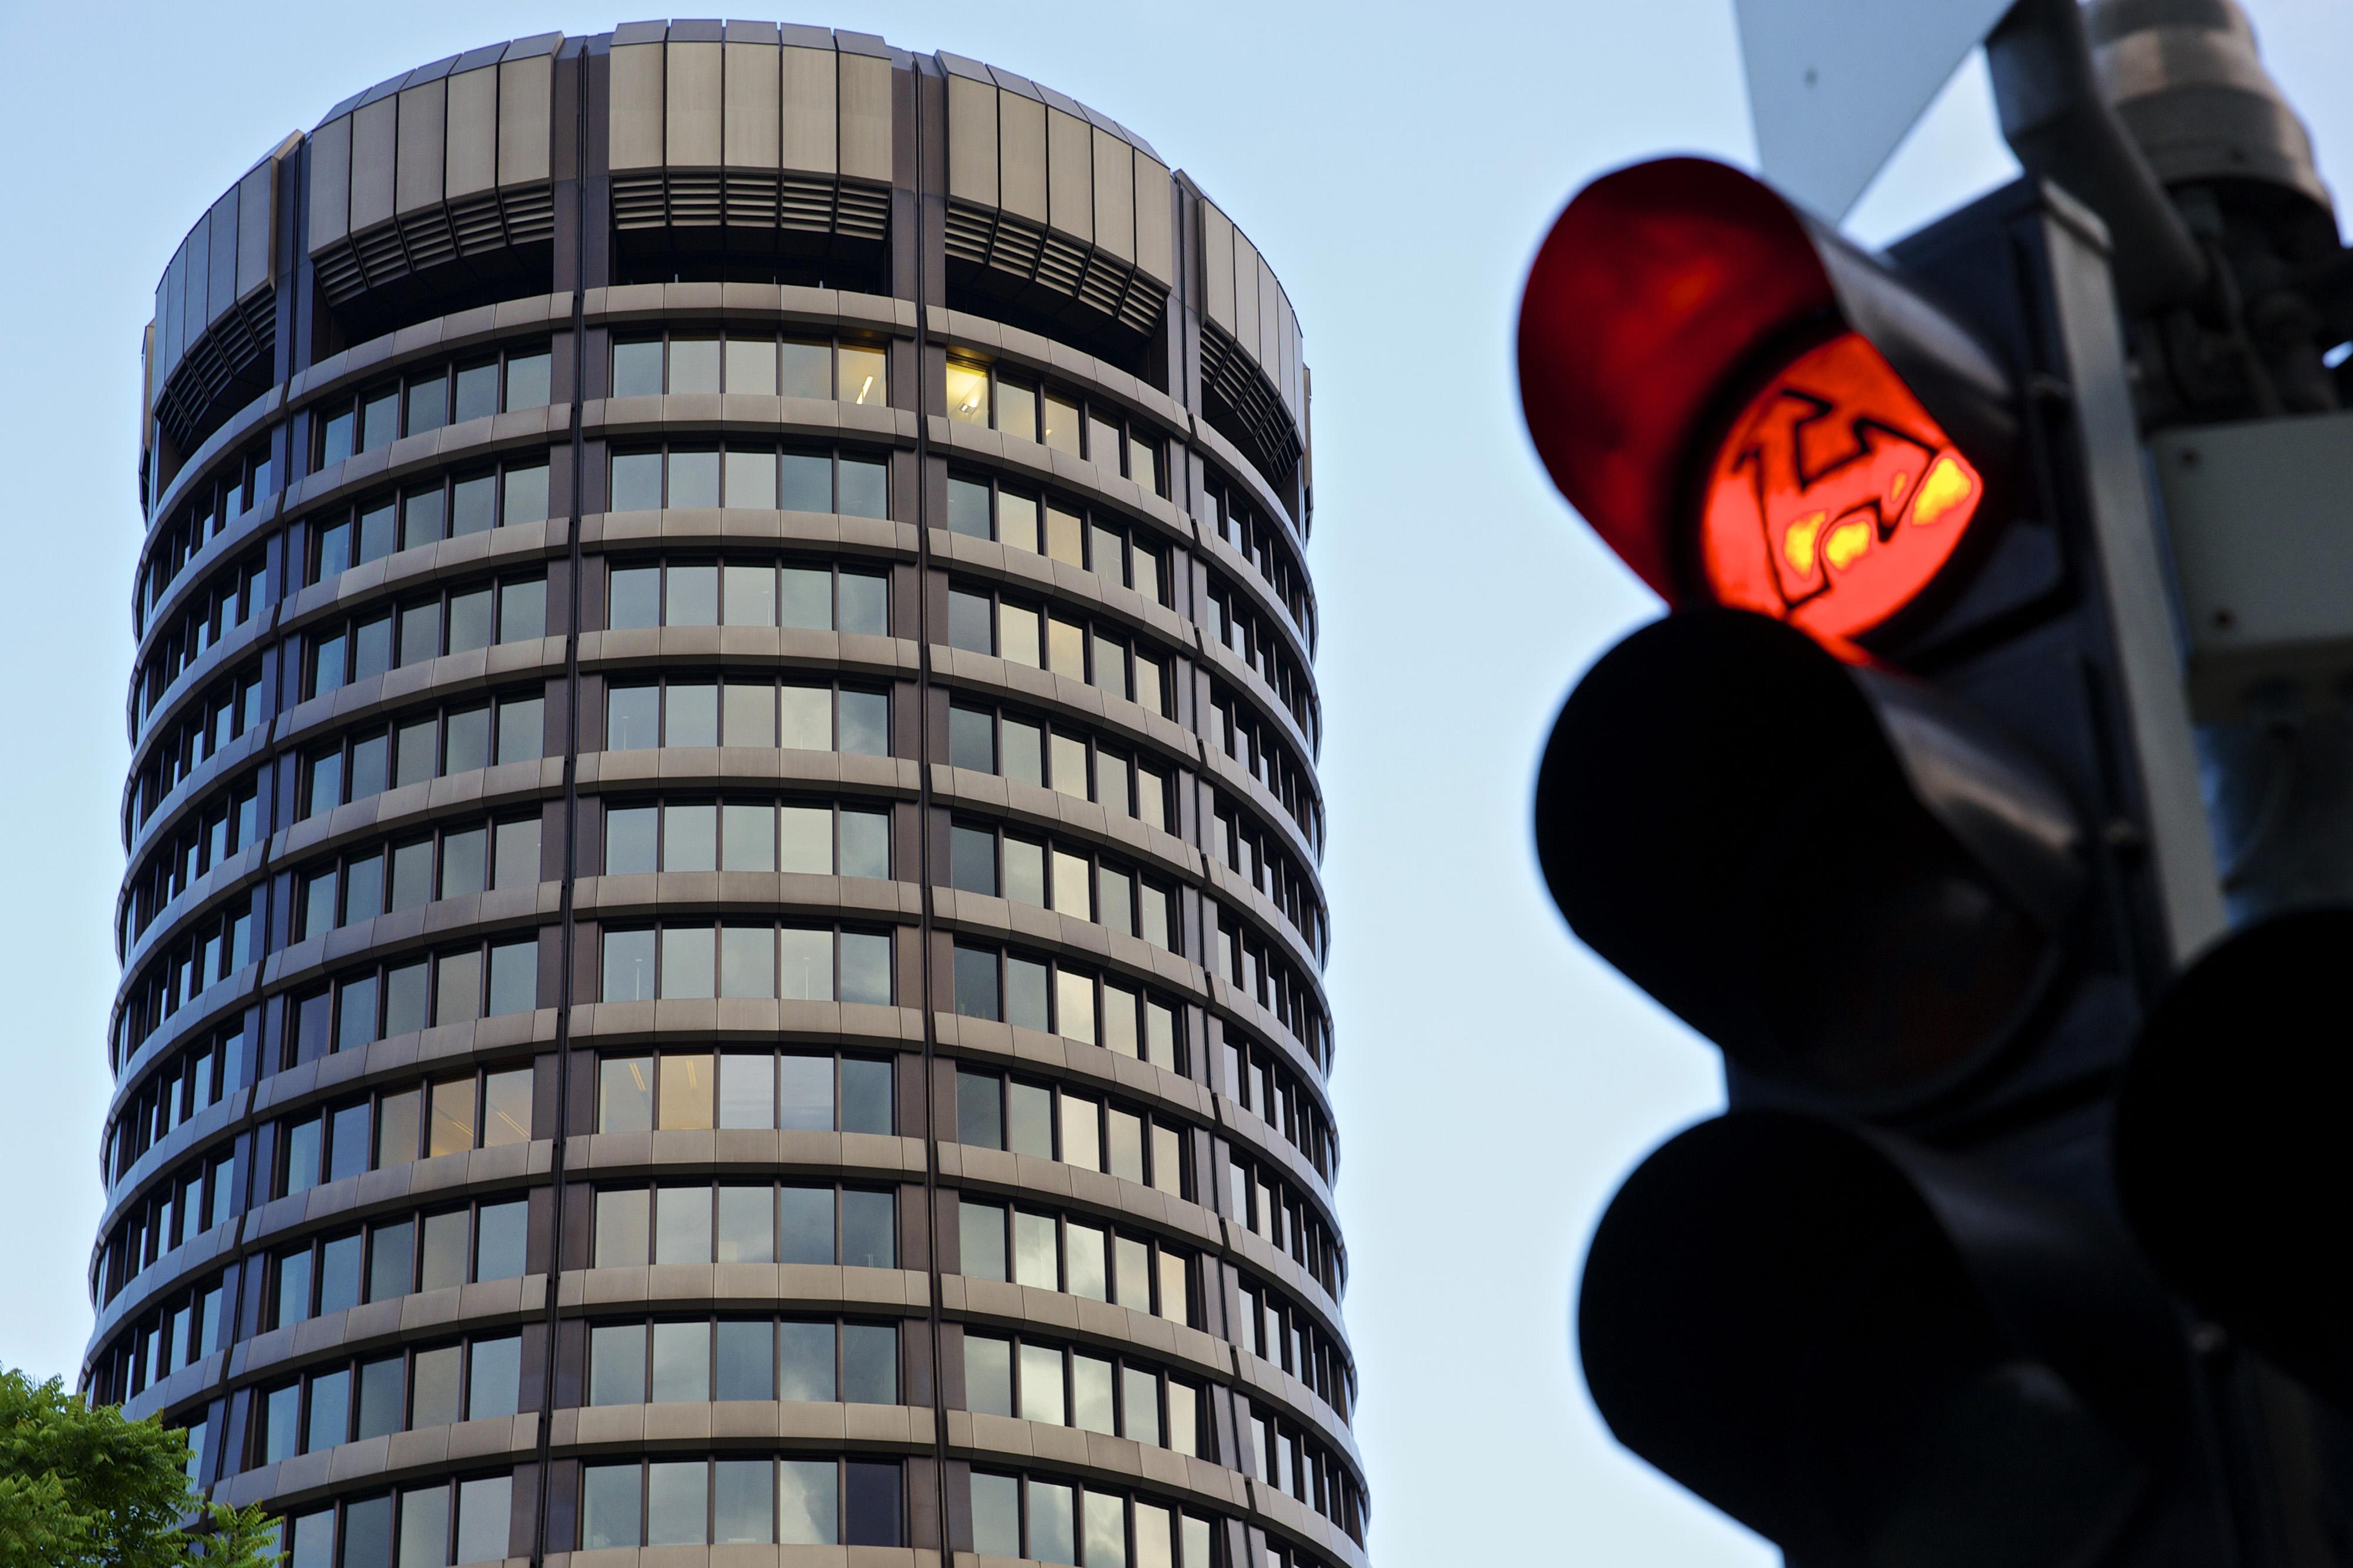 Bank For International Settlements Headquarters